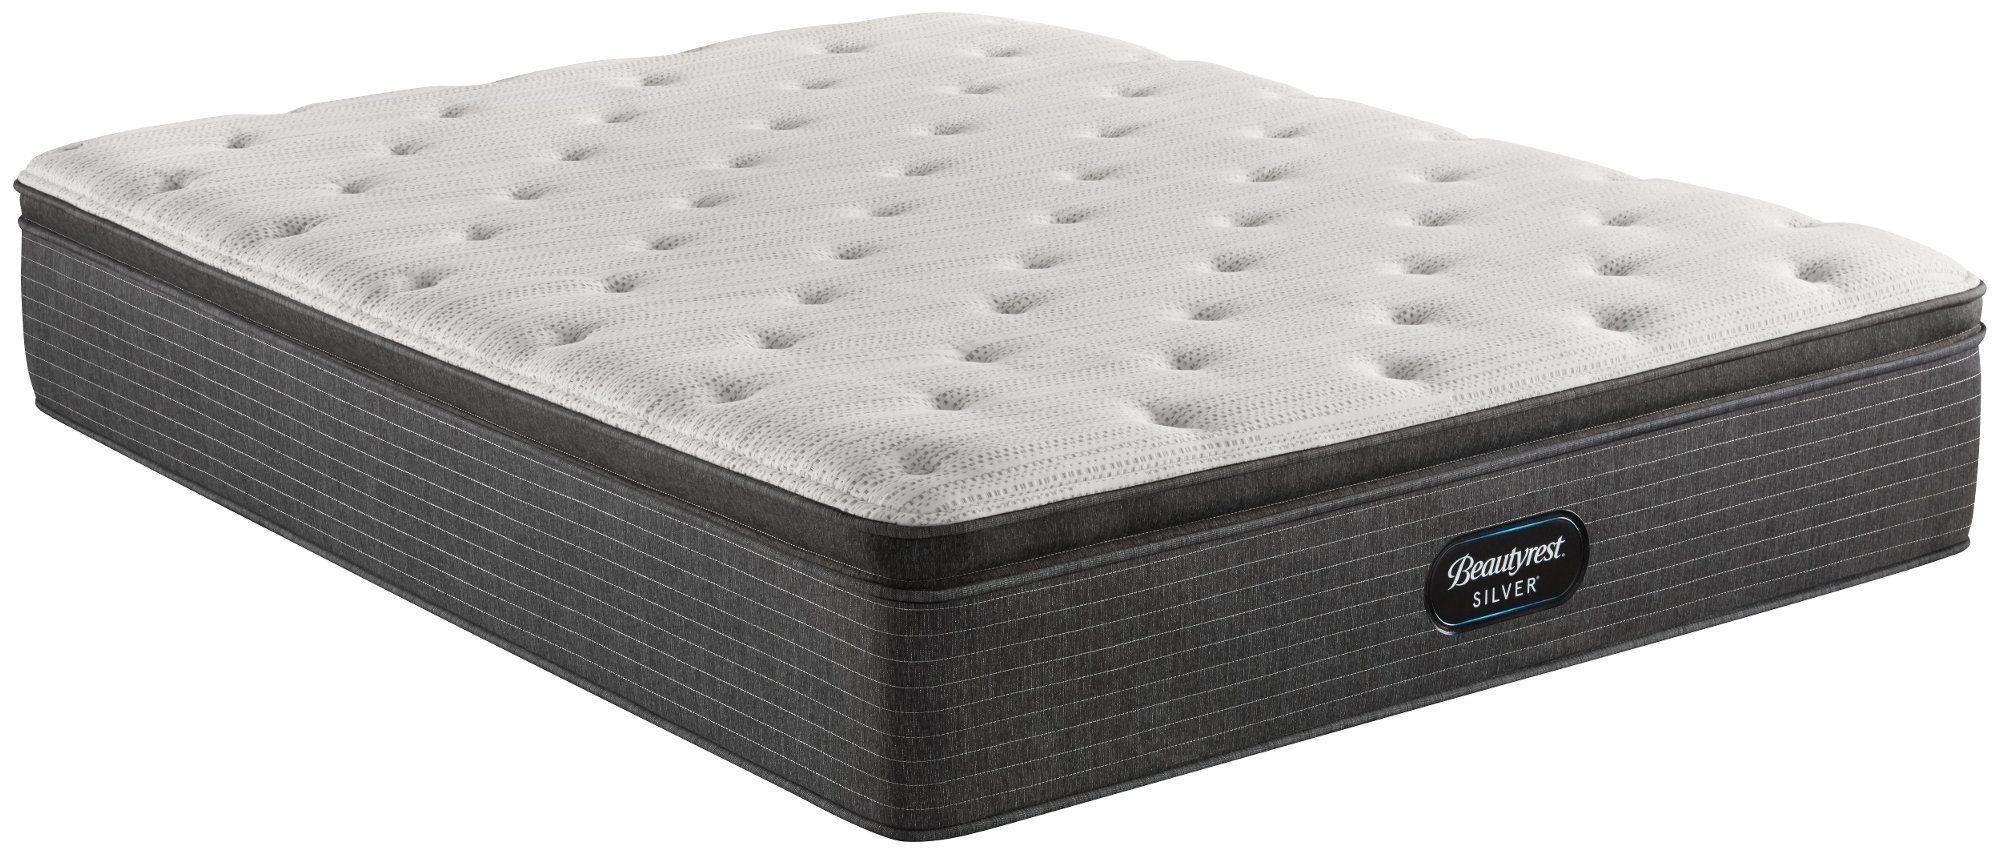 Beautyrest Silver Plush Pillow Top Twin Mattress Brampton In